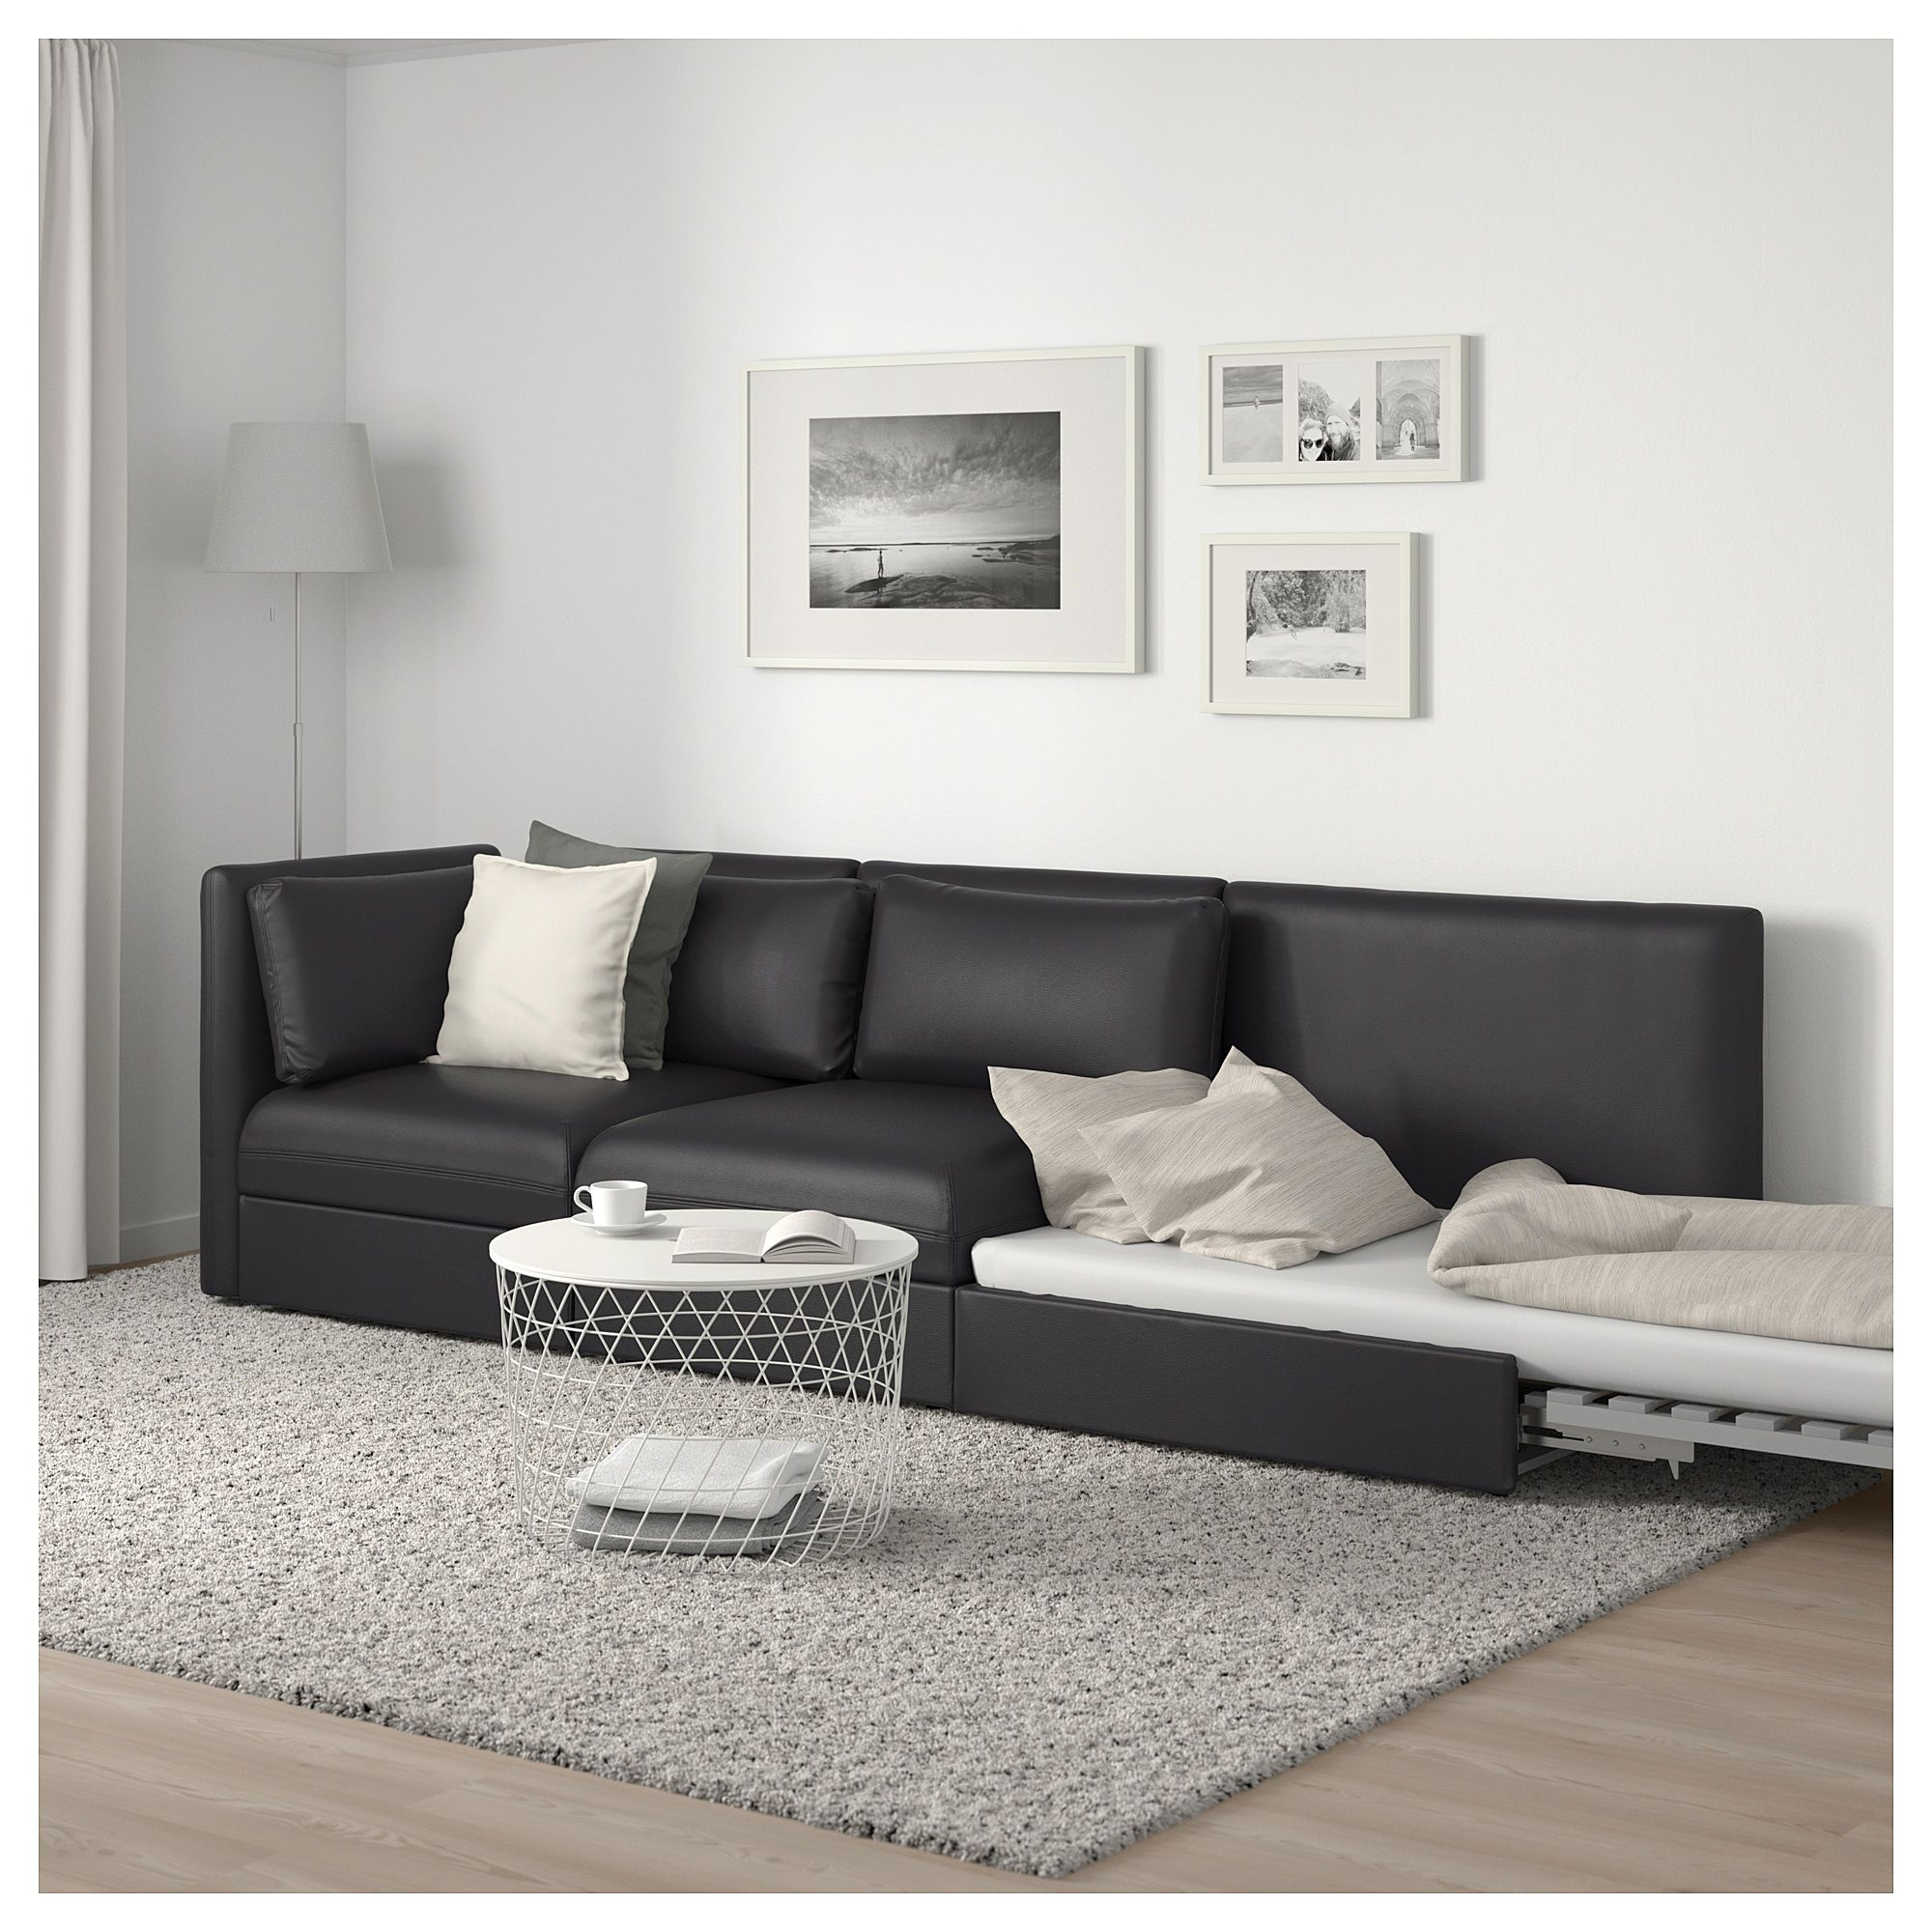 - IKEA - VALLENTUNA 3-seat Modular Sleeper Sofa With Open End, Murum